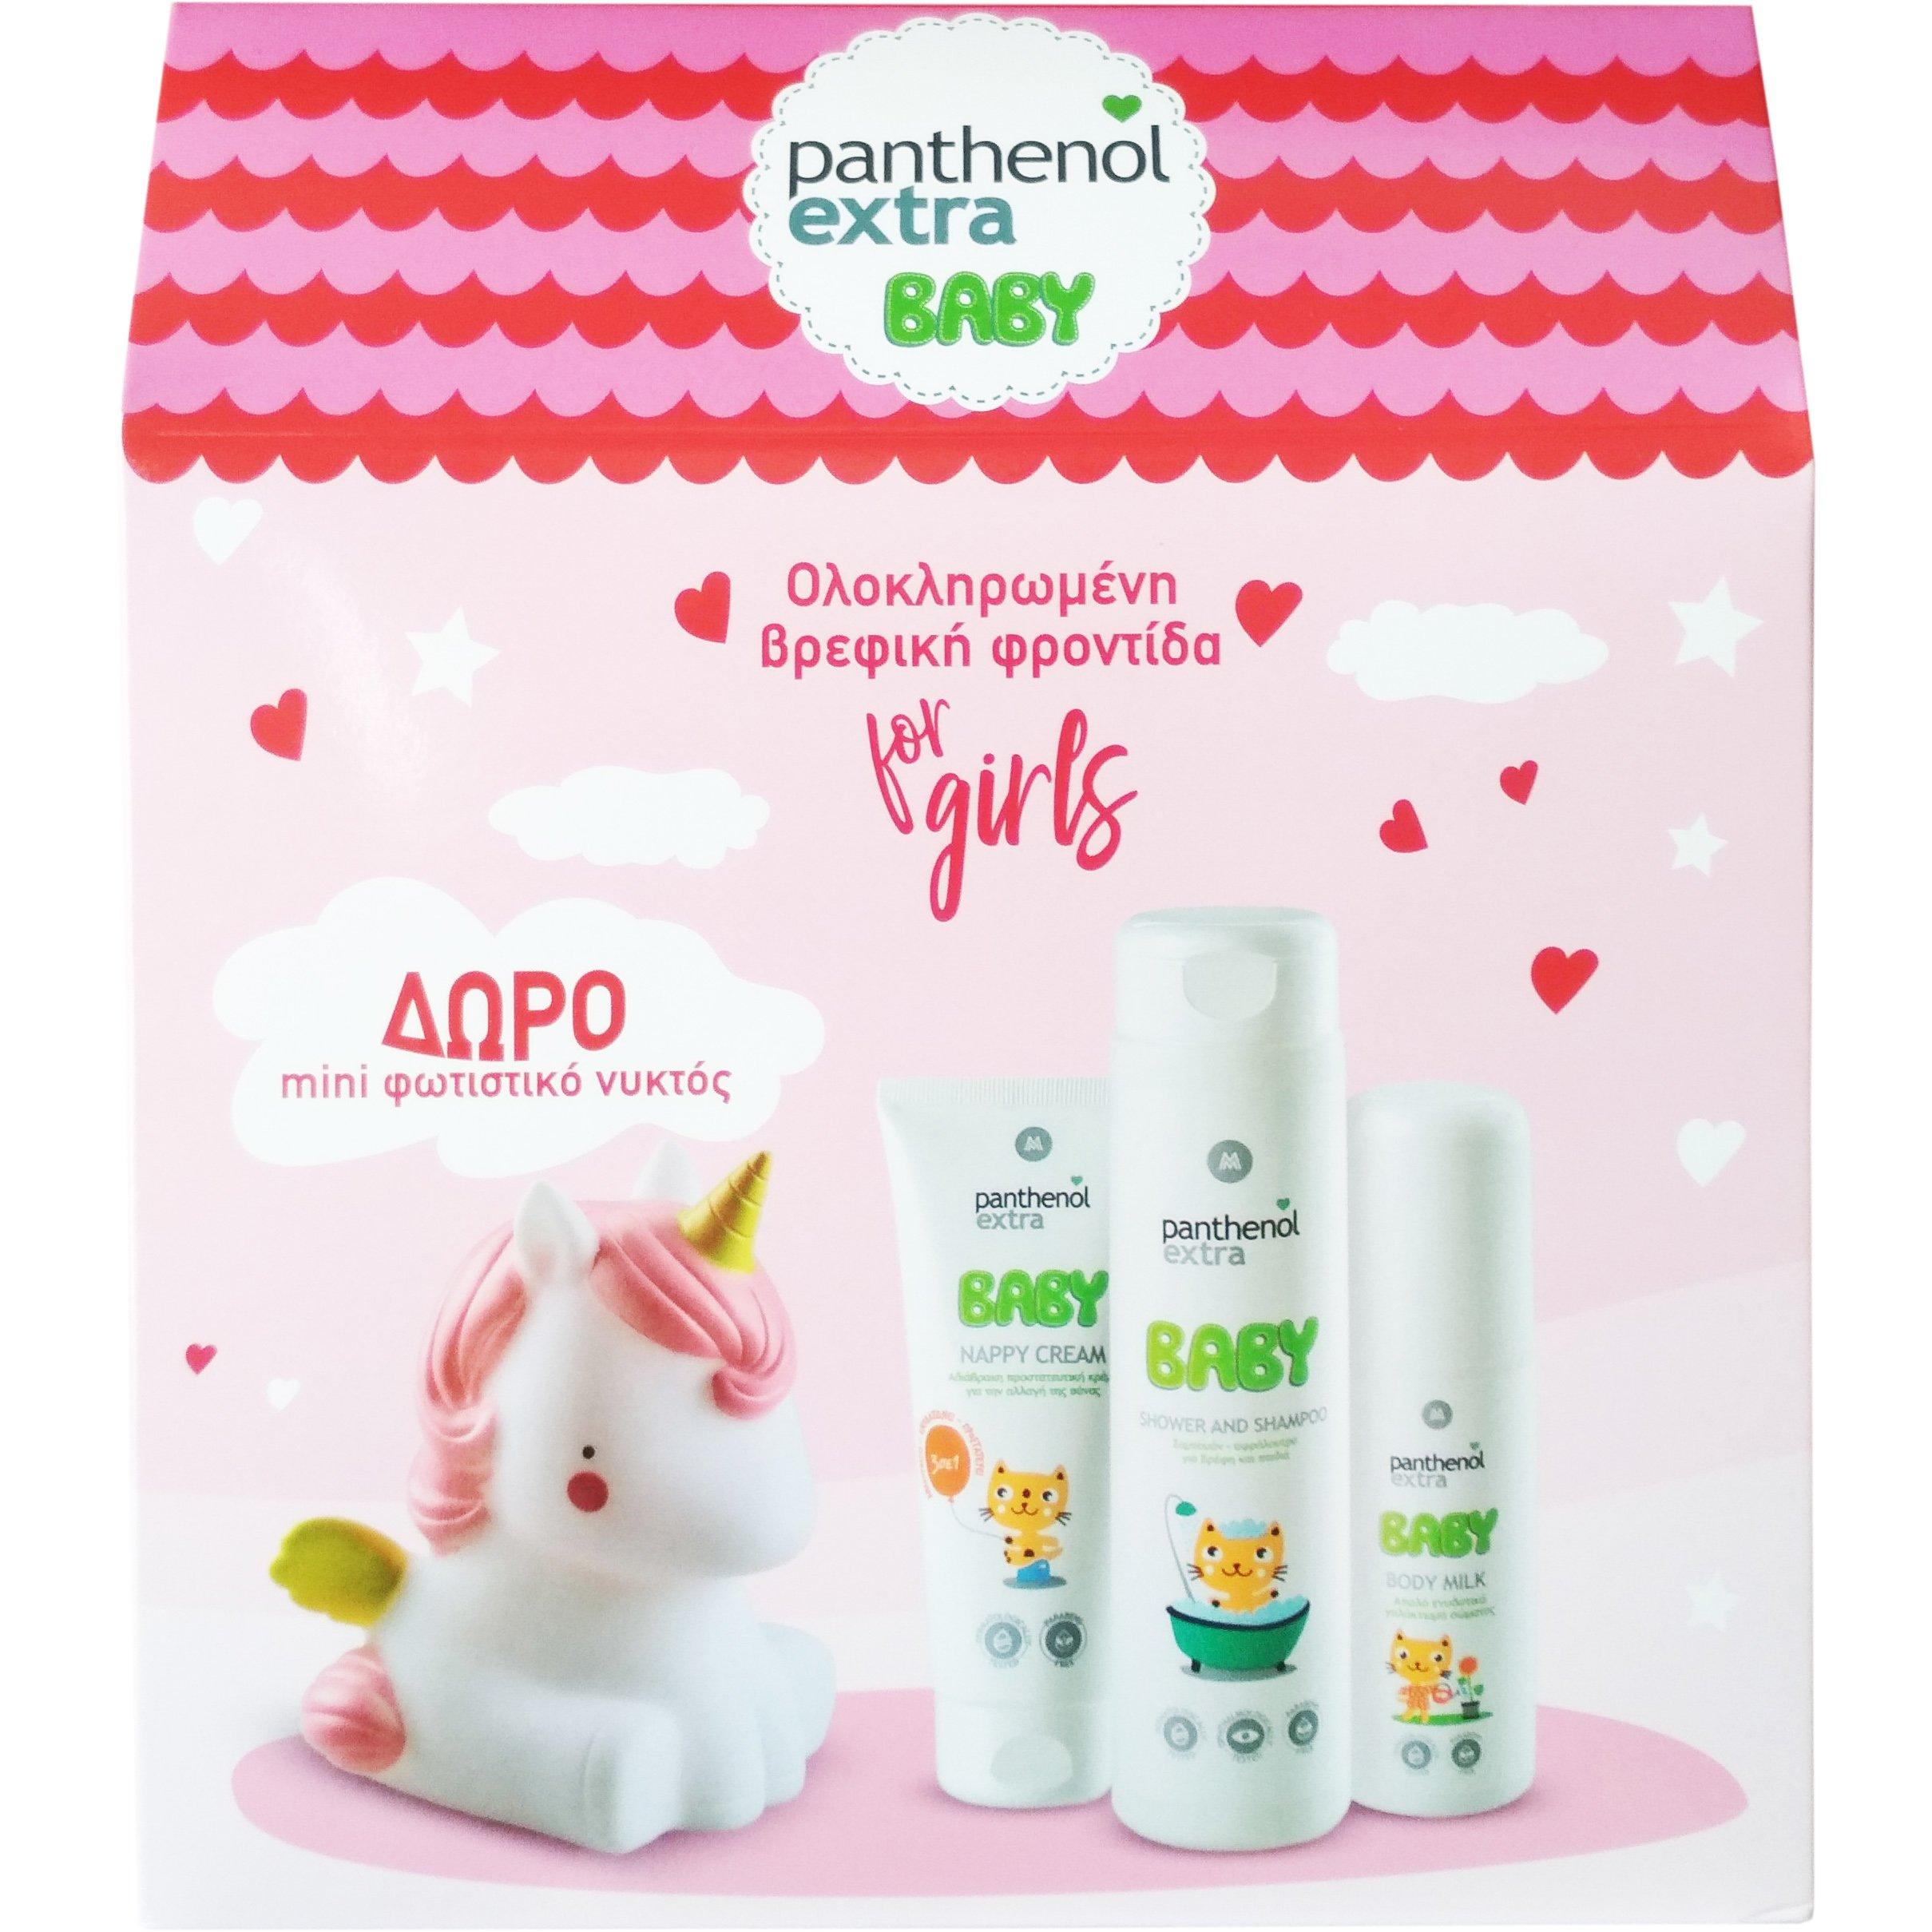 Medisei Panthenol Extra Baby Kit For Girls Ολοκληρωμένη Βρεφική Φροντίδα για Κορίτσια & Δώρο Mini Φωτιστικό Νυκτός